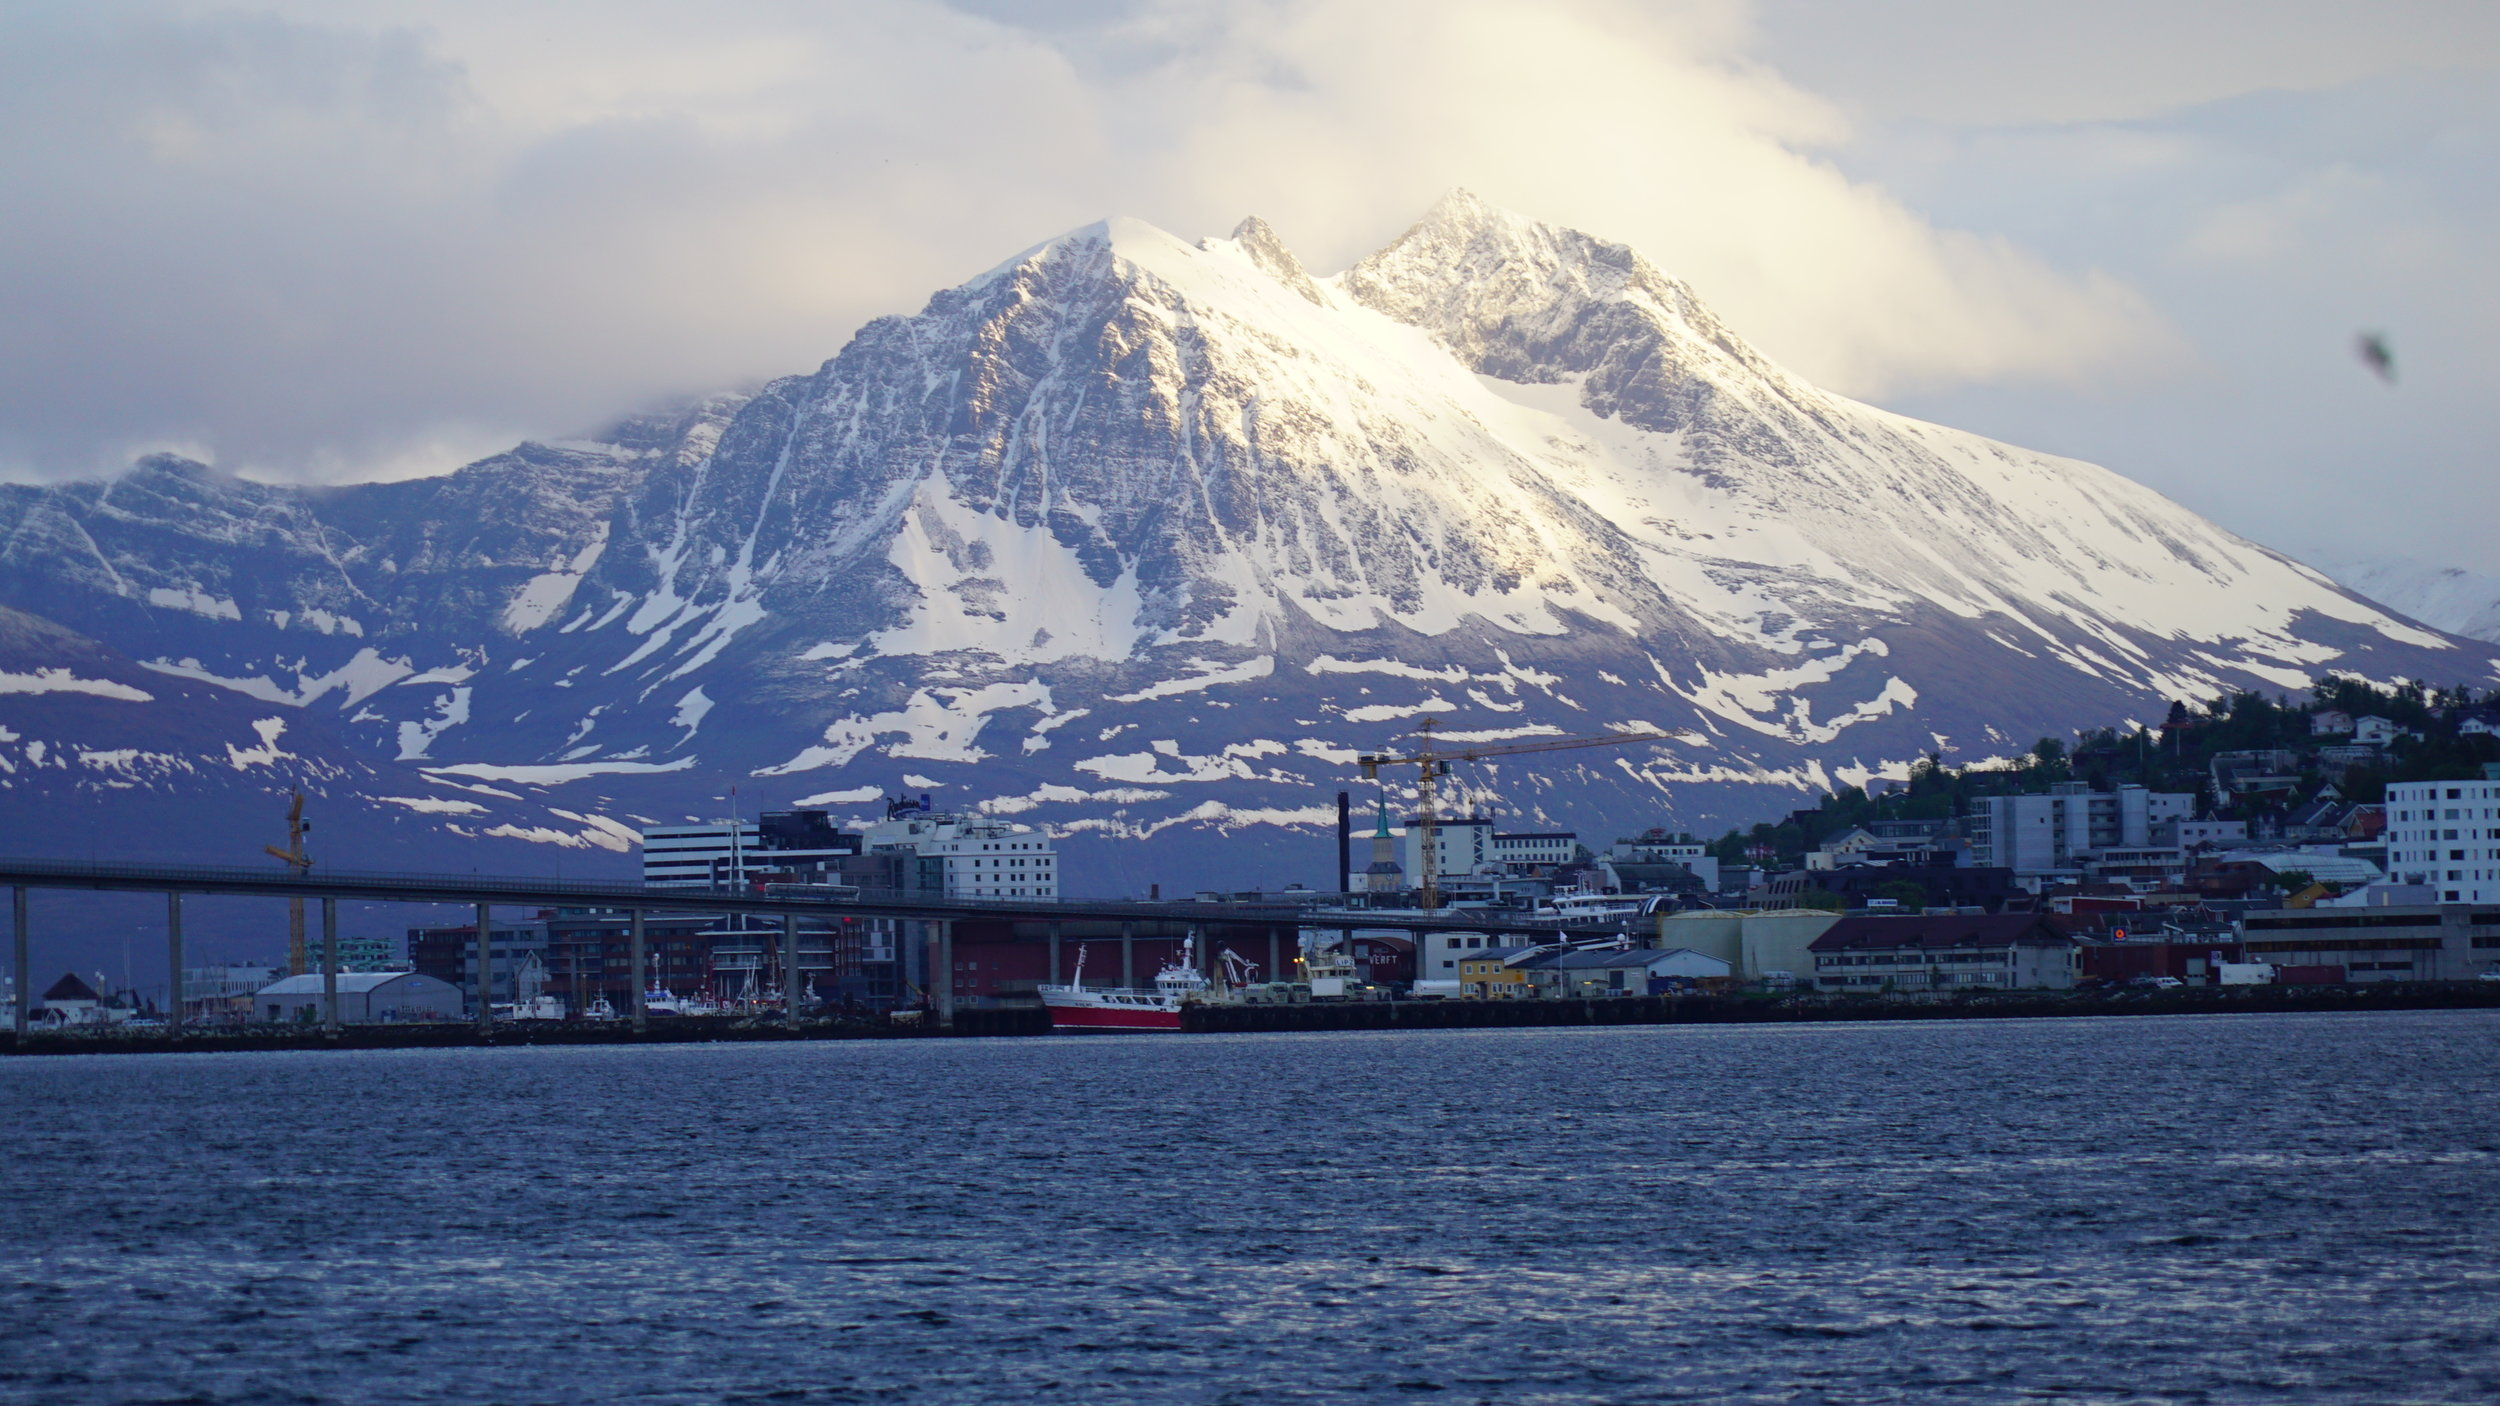 #Midnightsun Sailing |Arctic Princess |#Tromsø